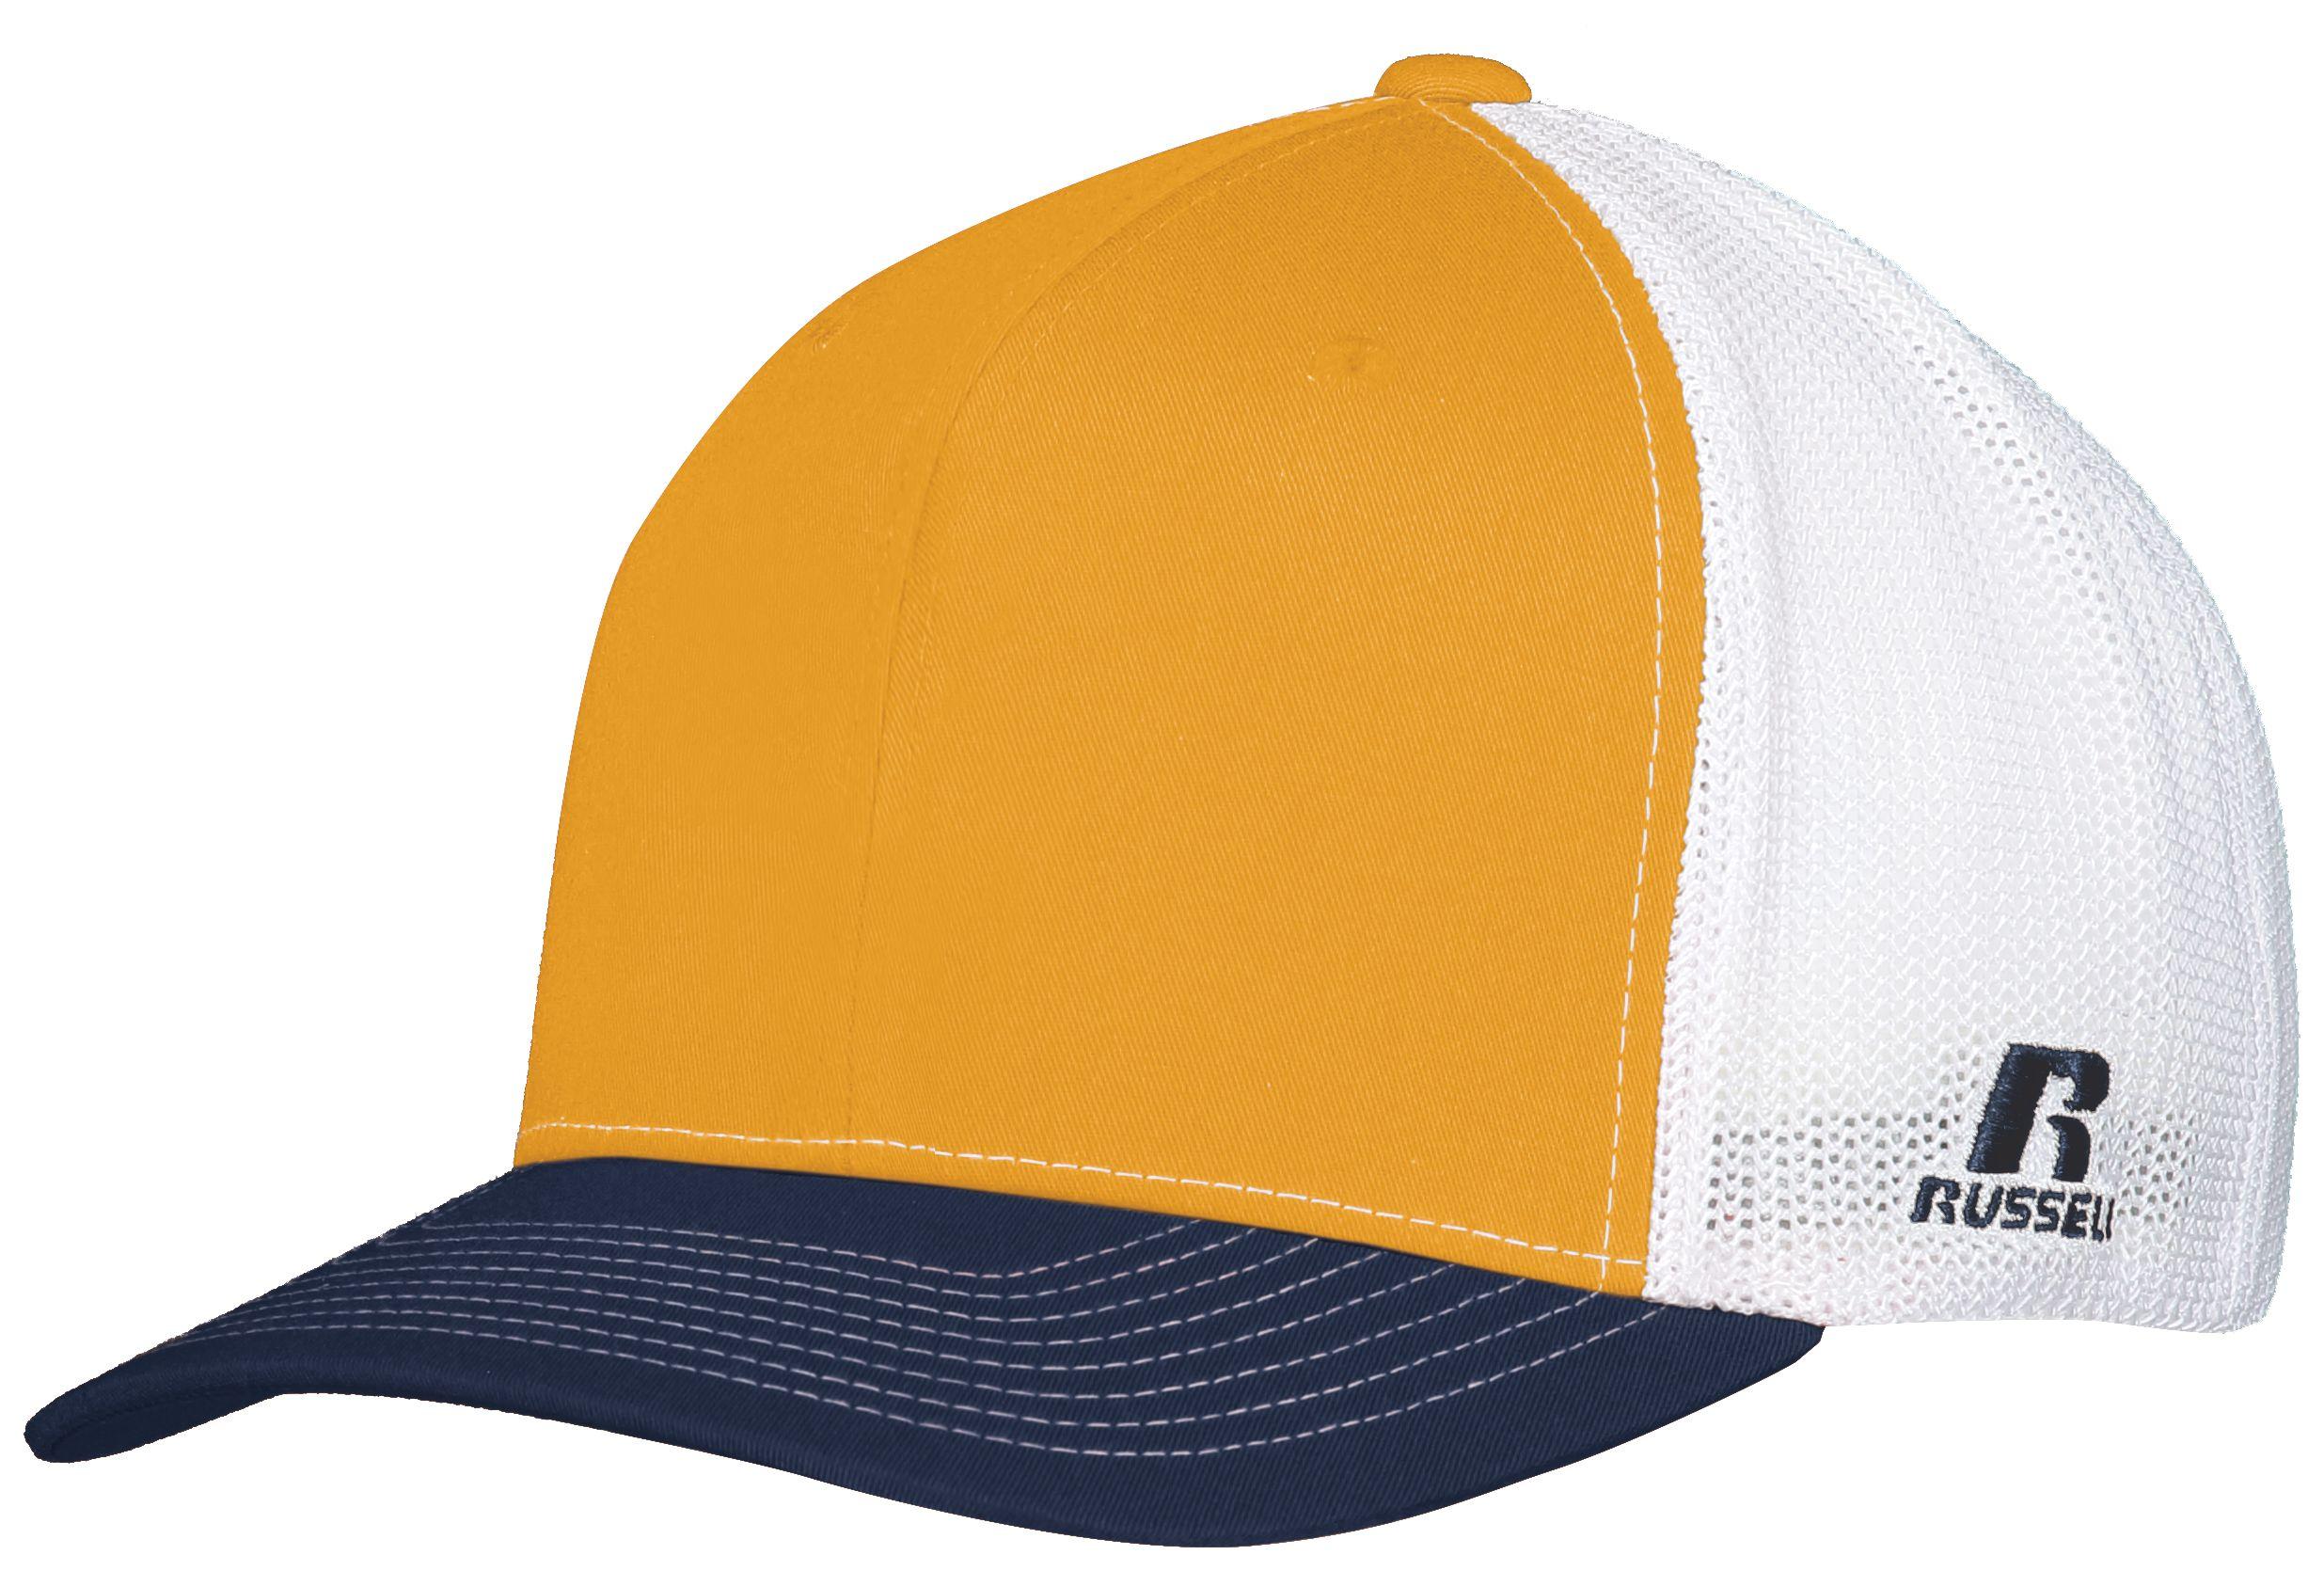 Flexfit Twill Mesh Cap - GOLD/NAVY/WHITE